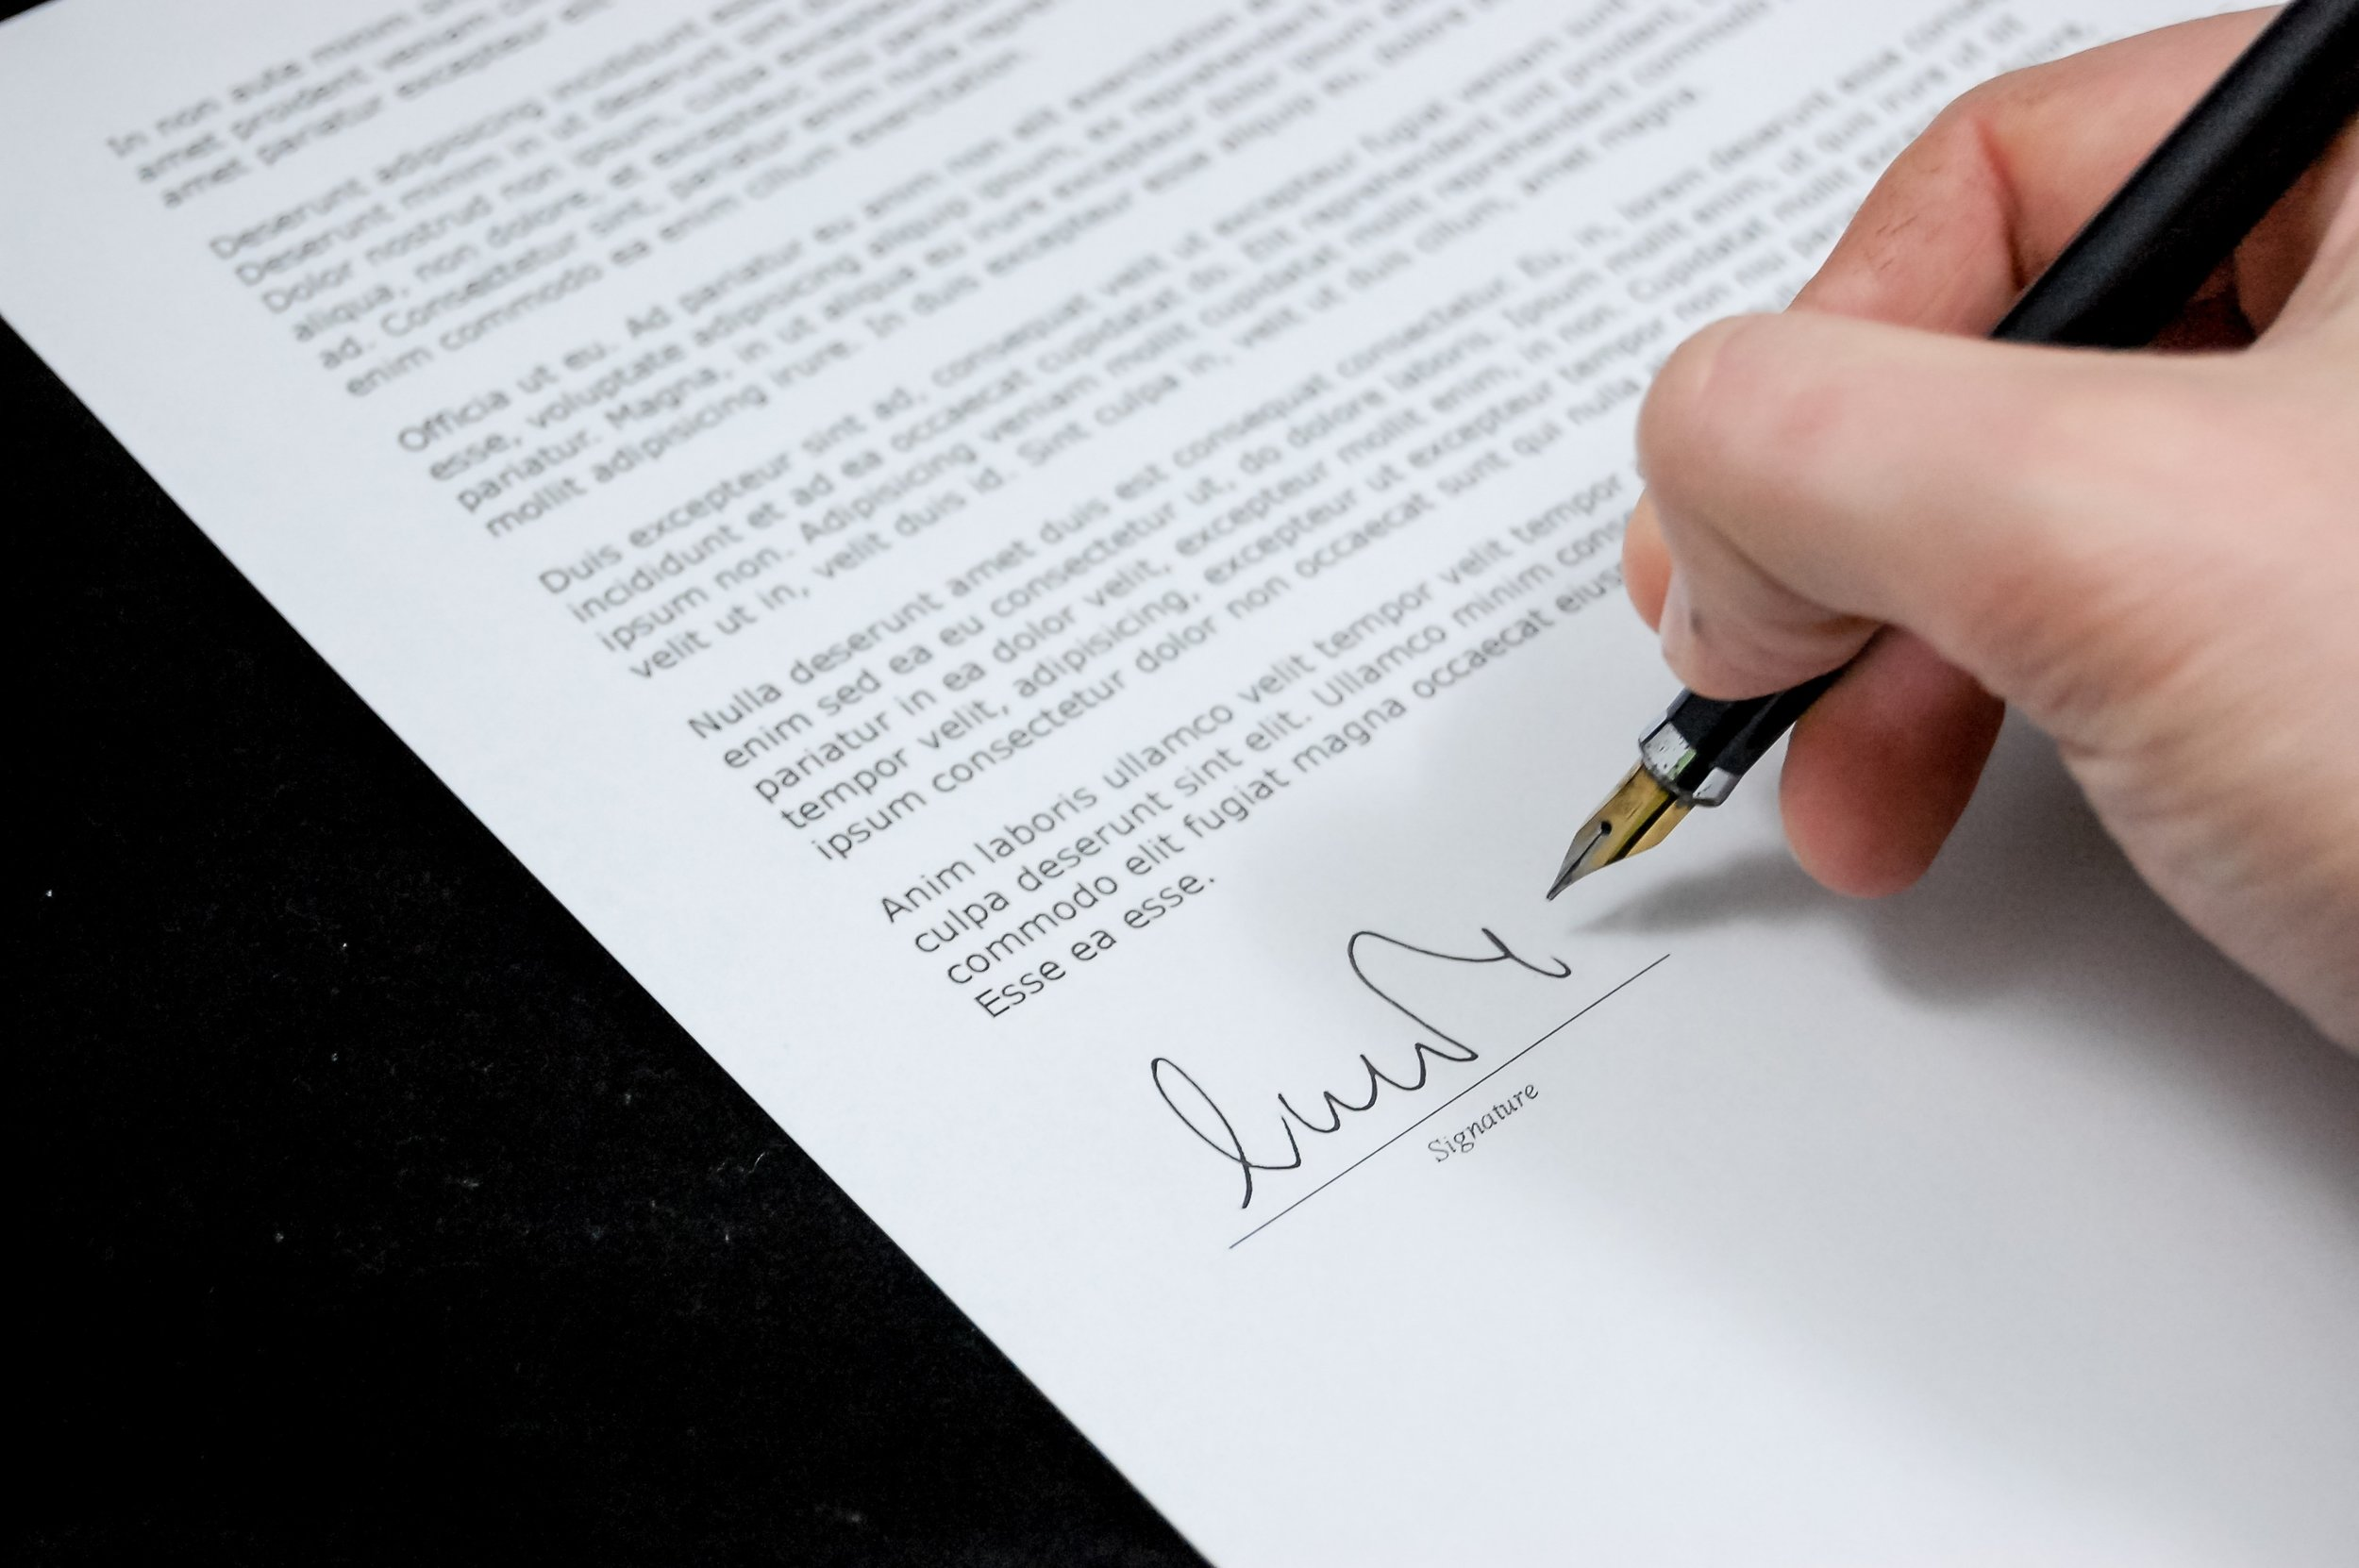 document-agreement-documents-sign-48195.jpeg